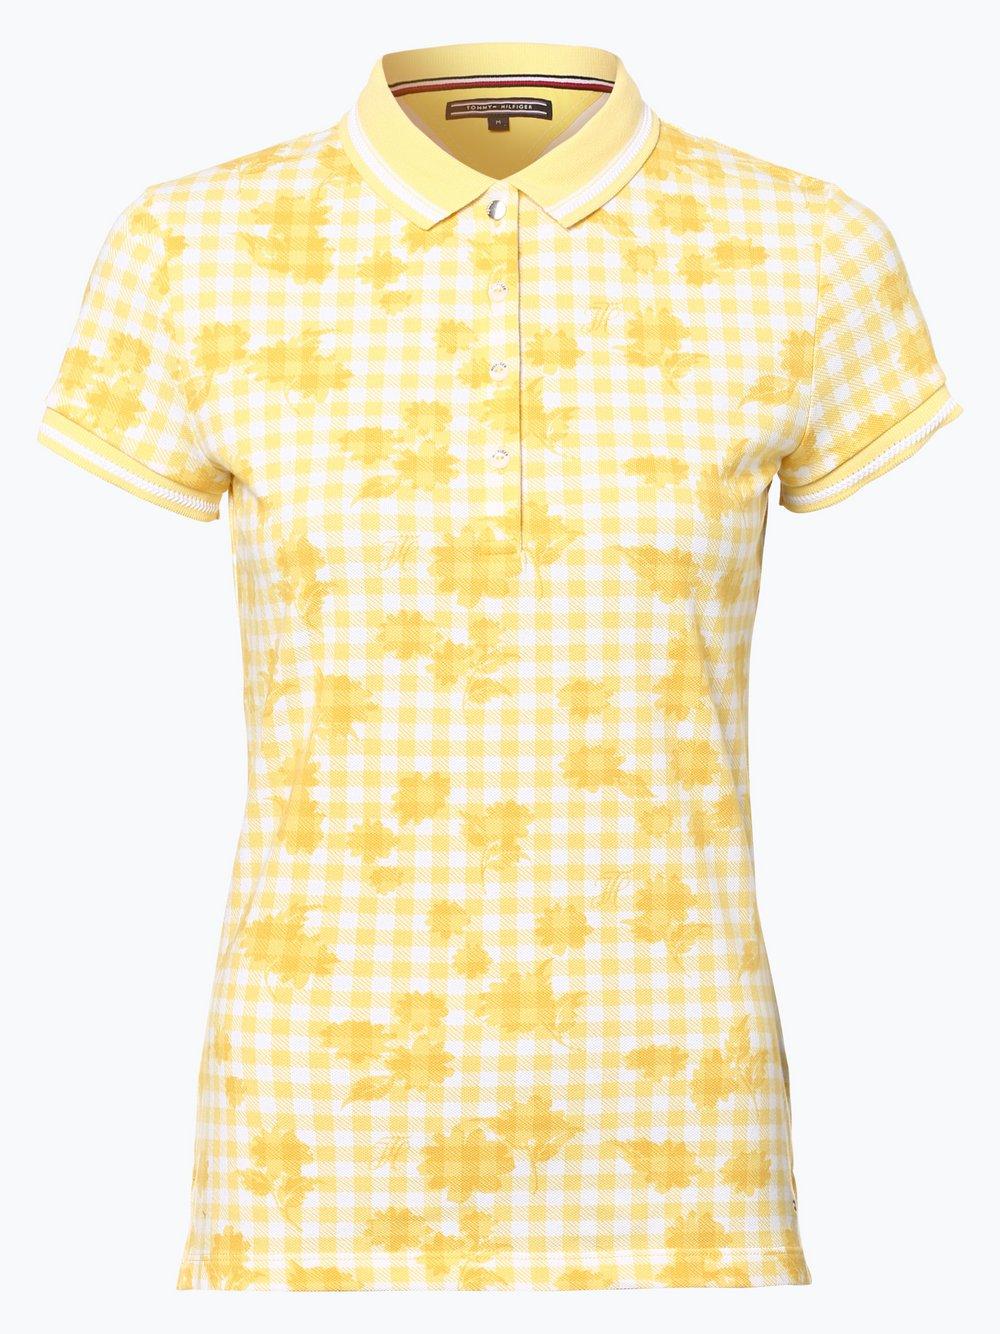 best service e8cf5 981c1 Tommy Hilfiger Damen Poloshirt - New Chiara online kaufen ...